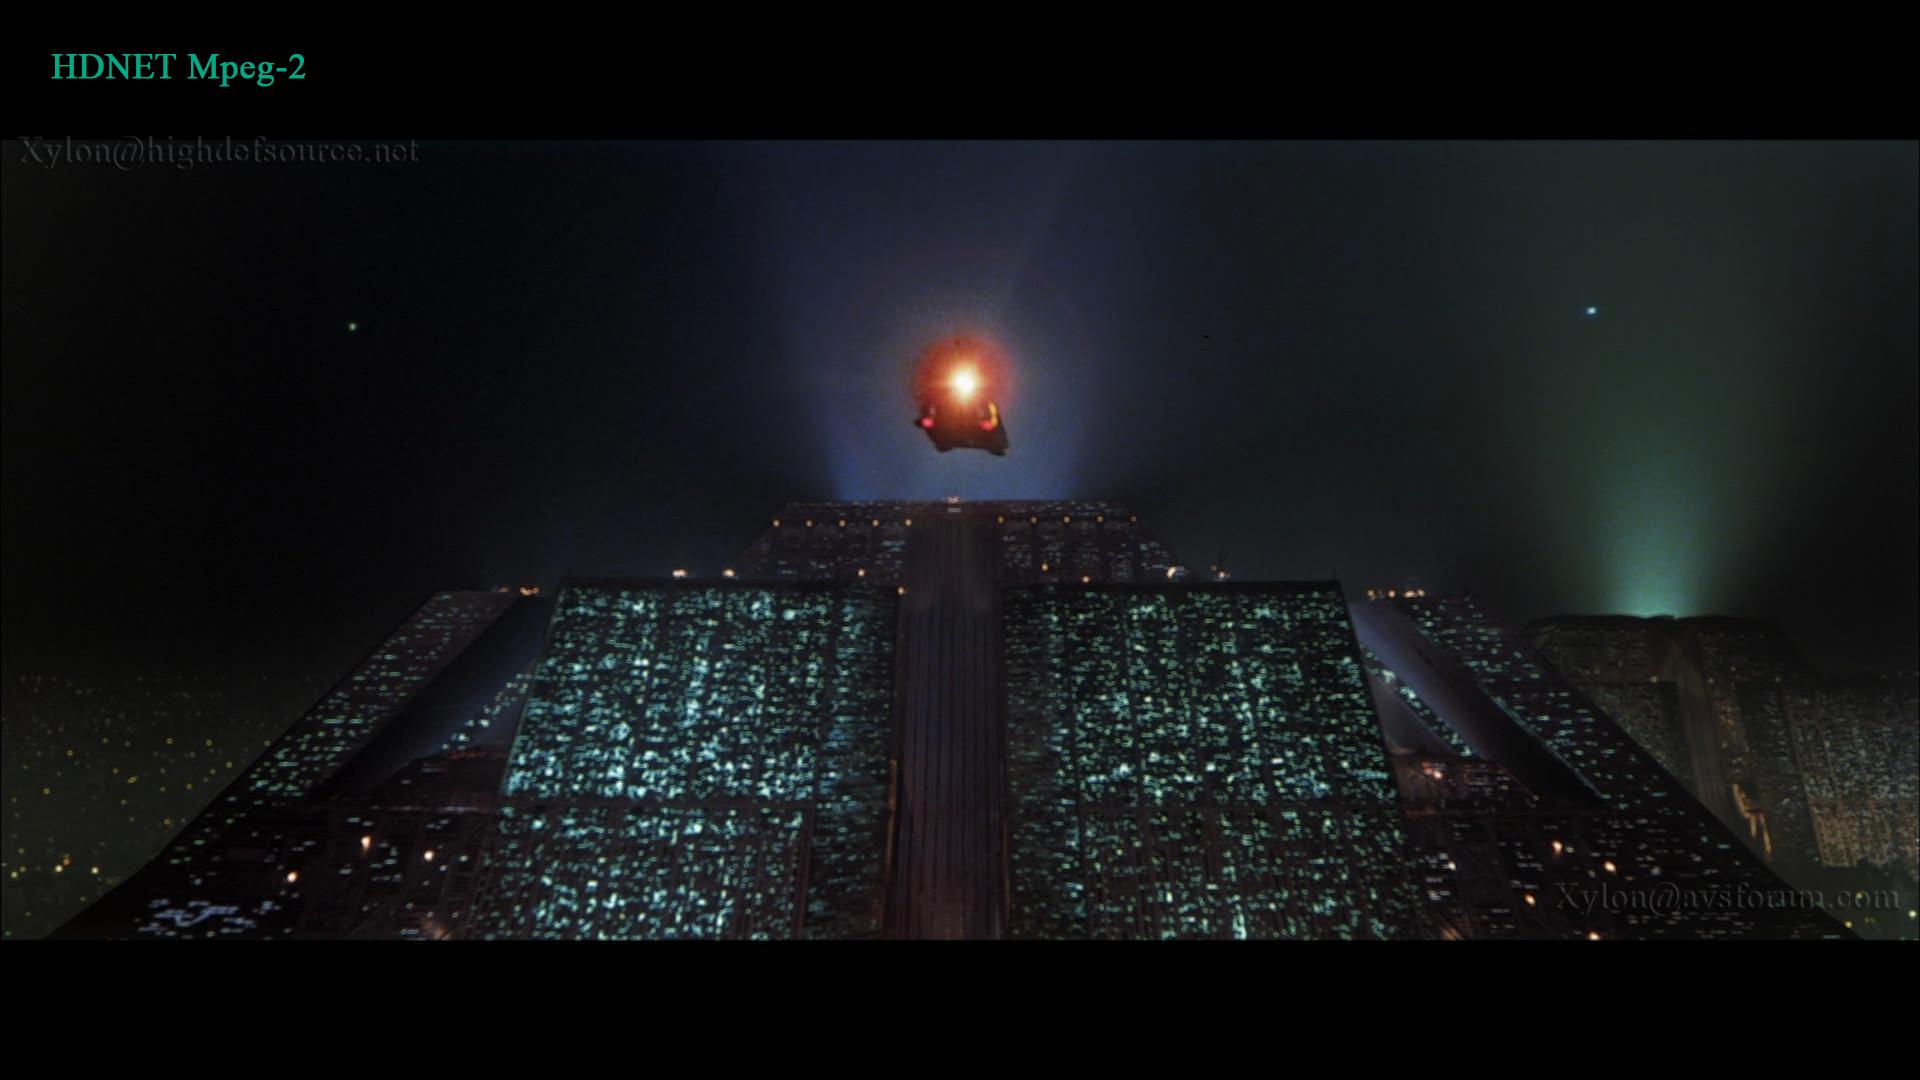 Blade Runner Wallpaper 1920x1080 Blade Runner Science Fiction 1920x1080